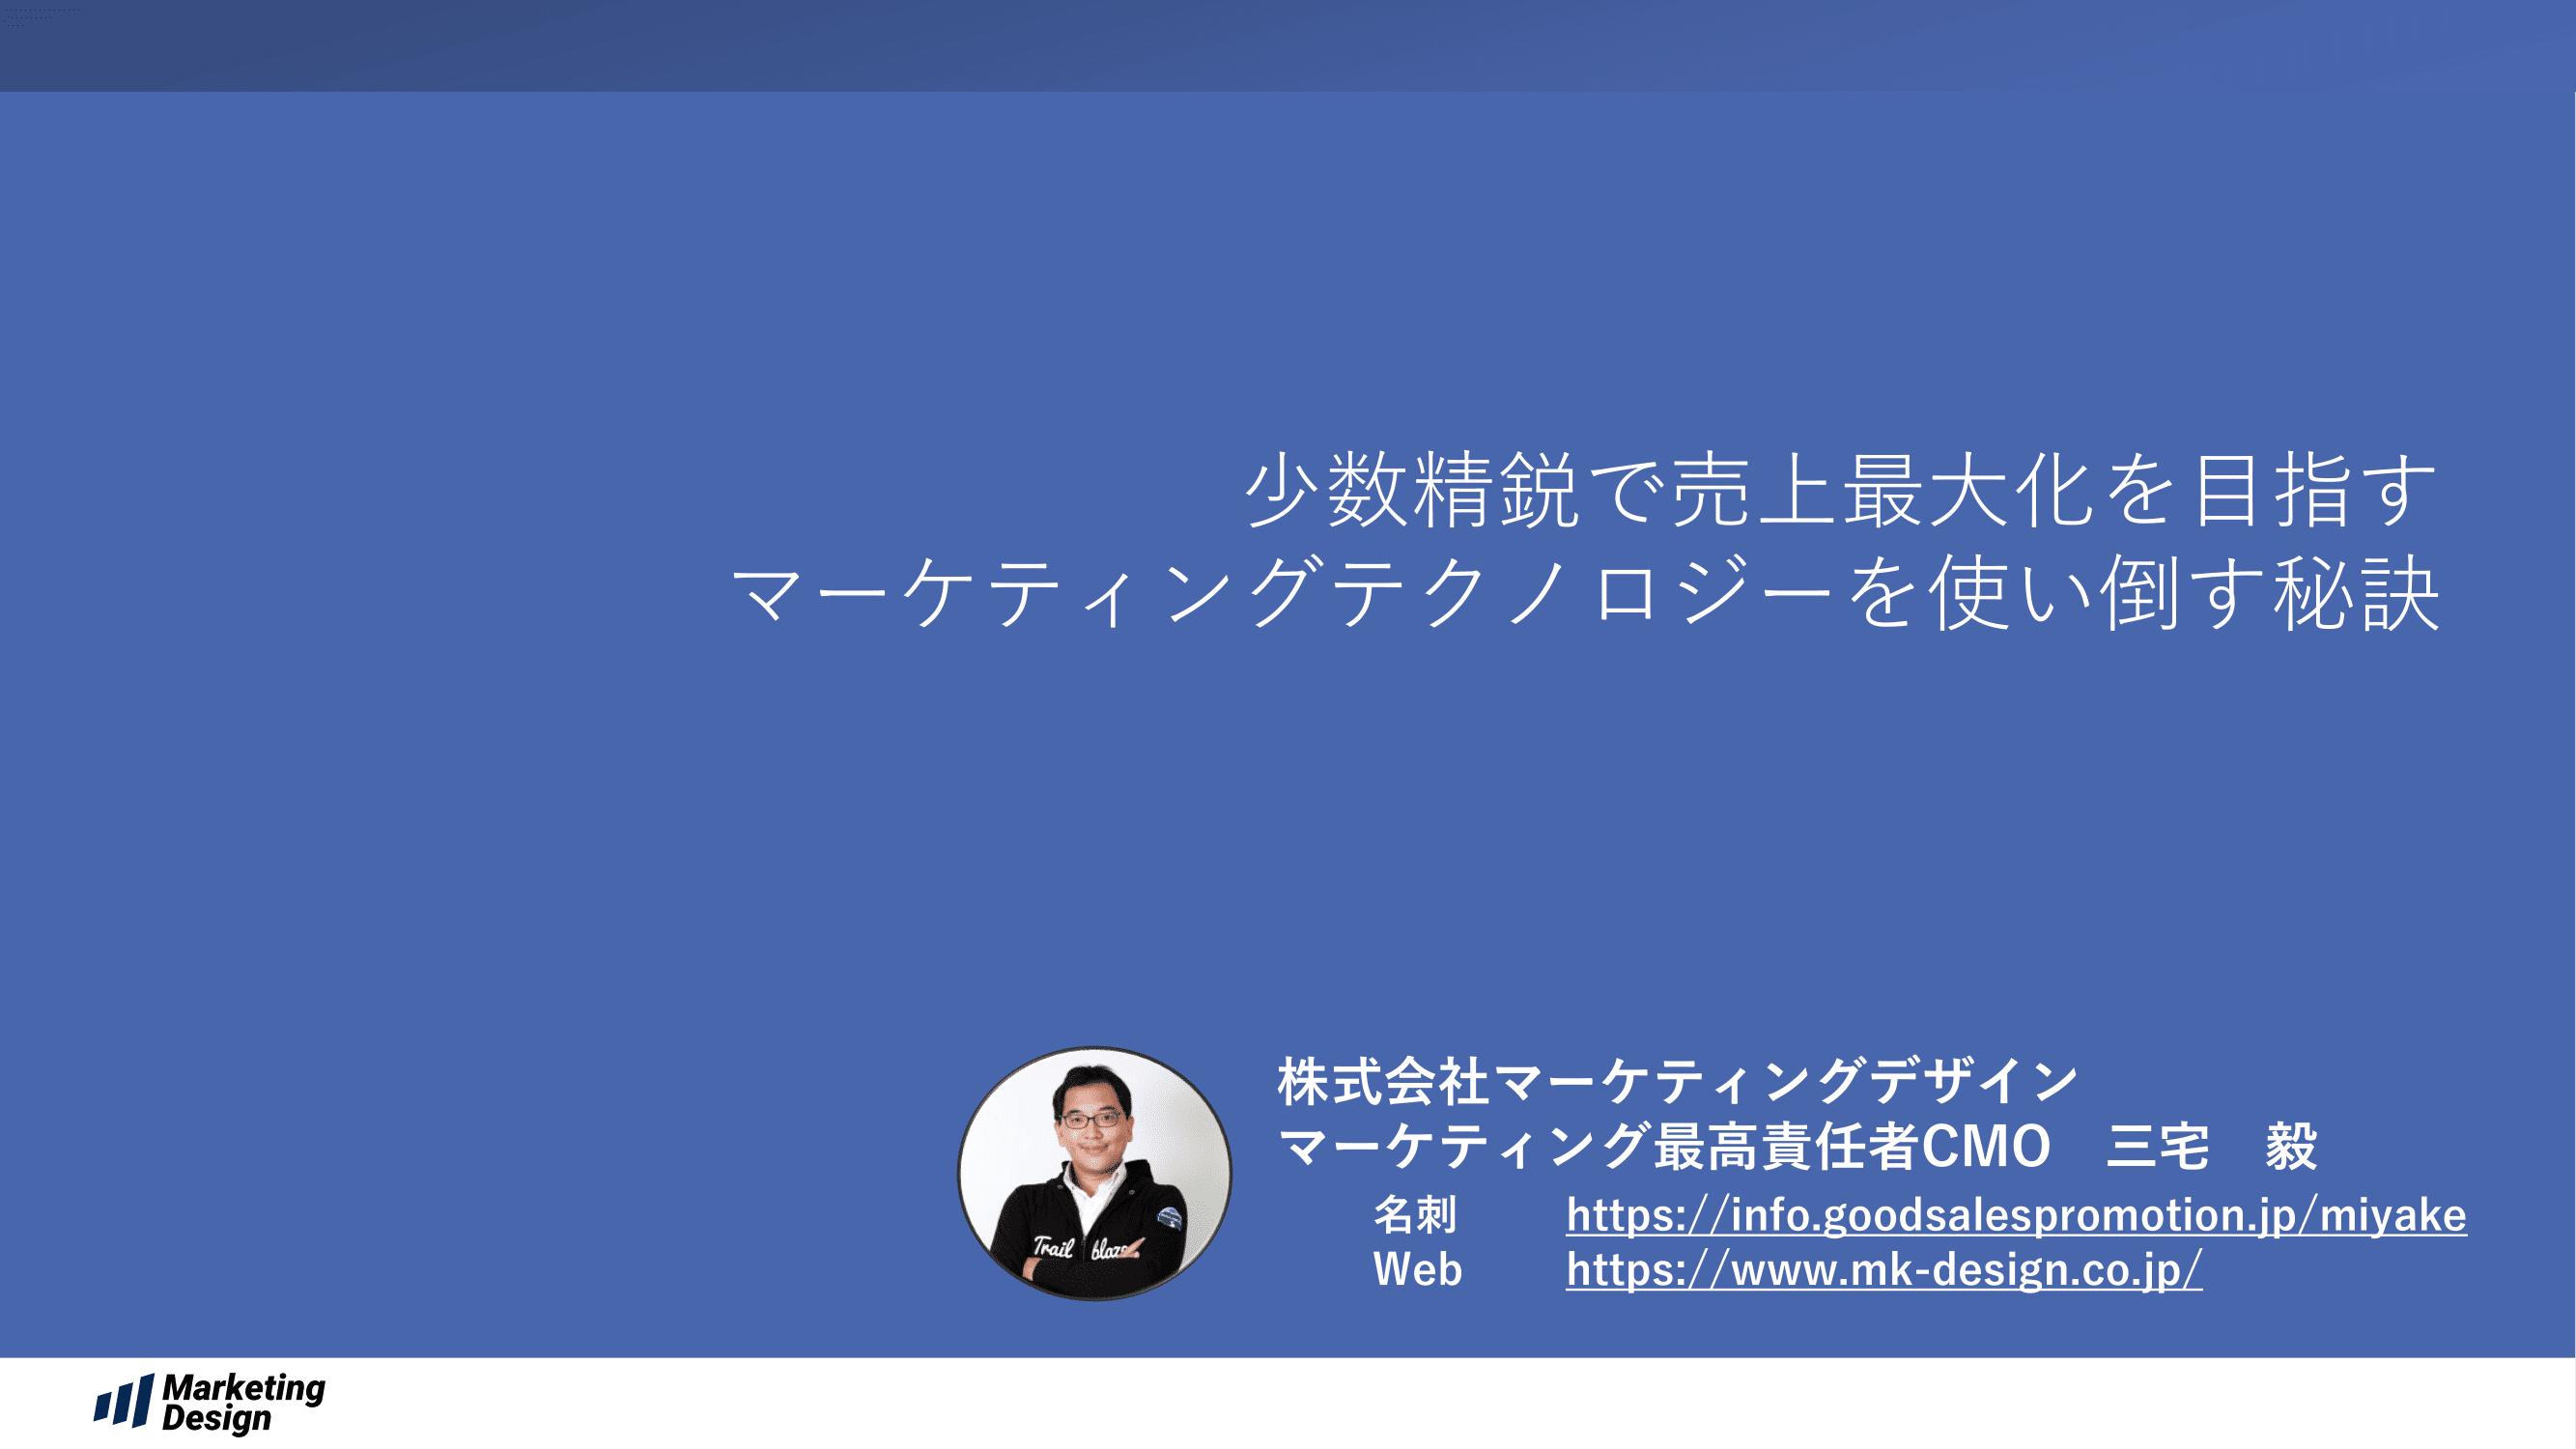 210616 Salesforce Live_mk-design-01